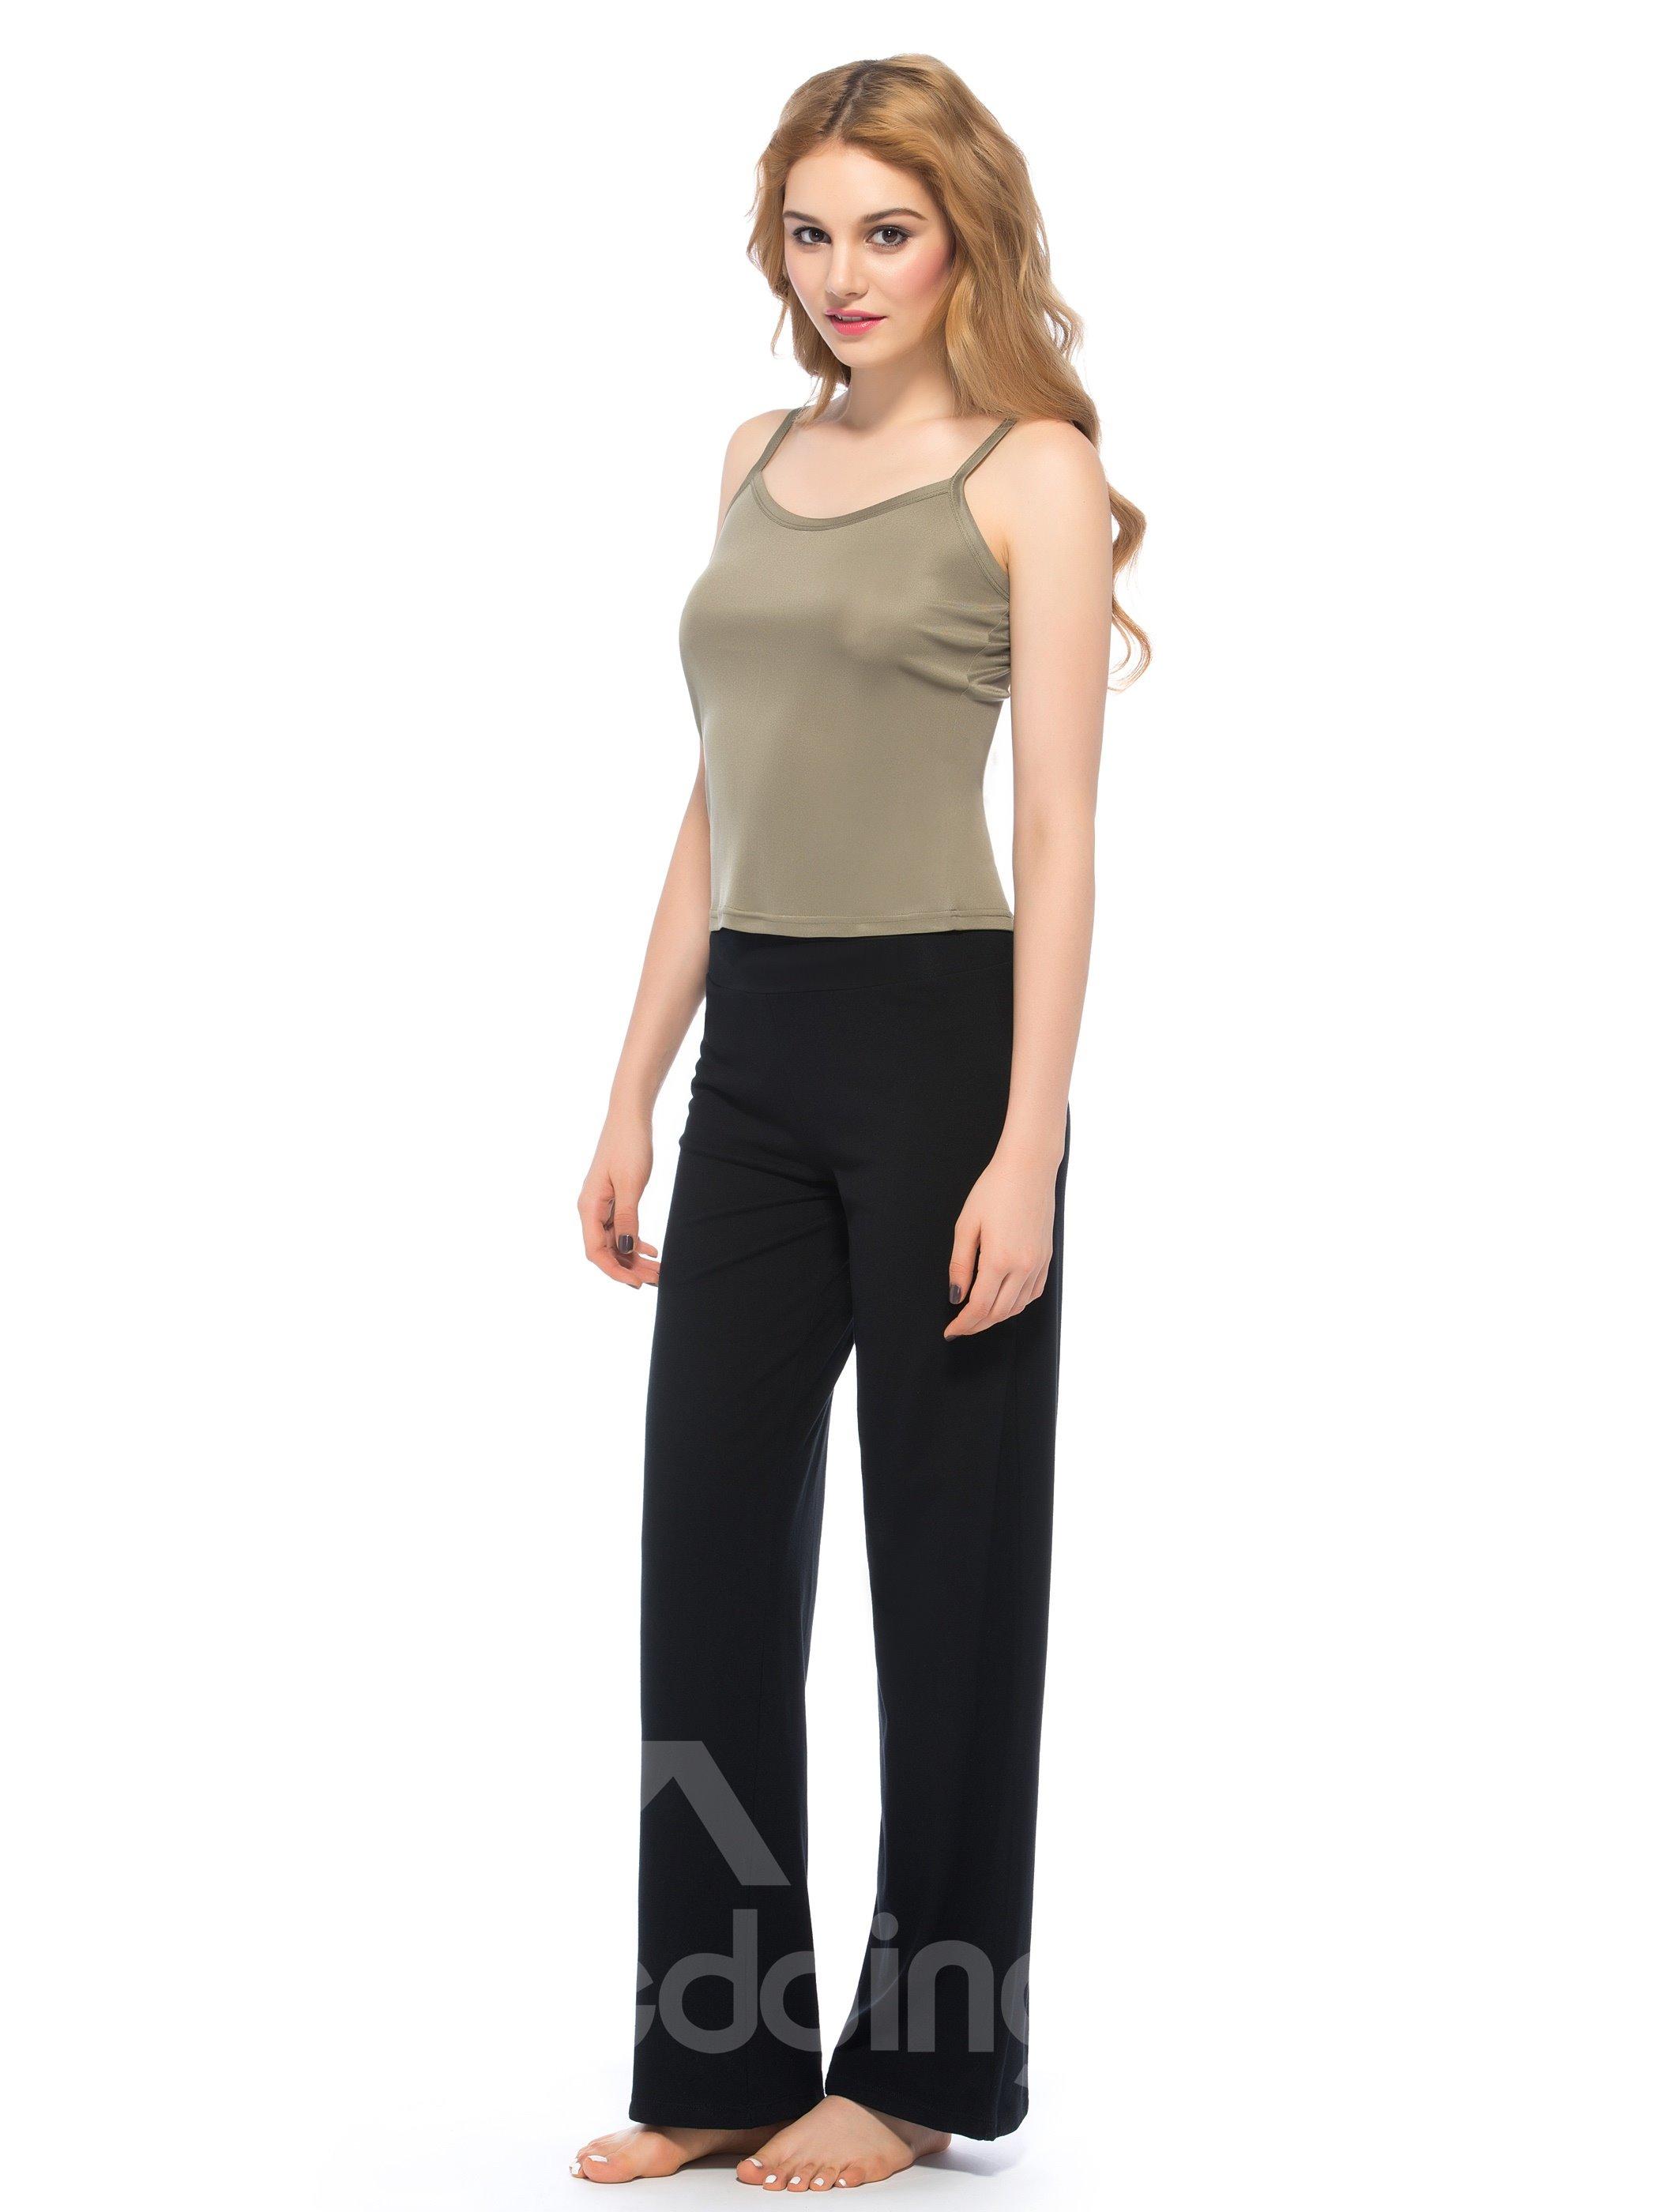 Top Quality Stylish Bronze Edged Silk Camisoles